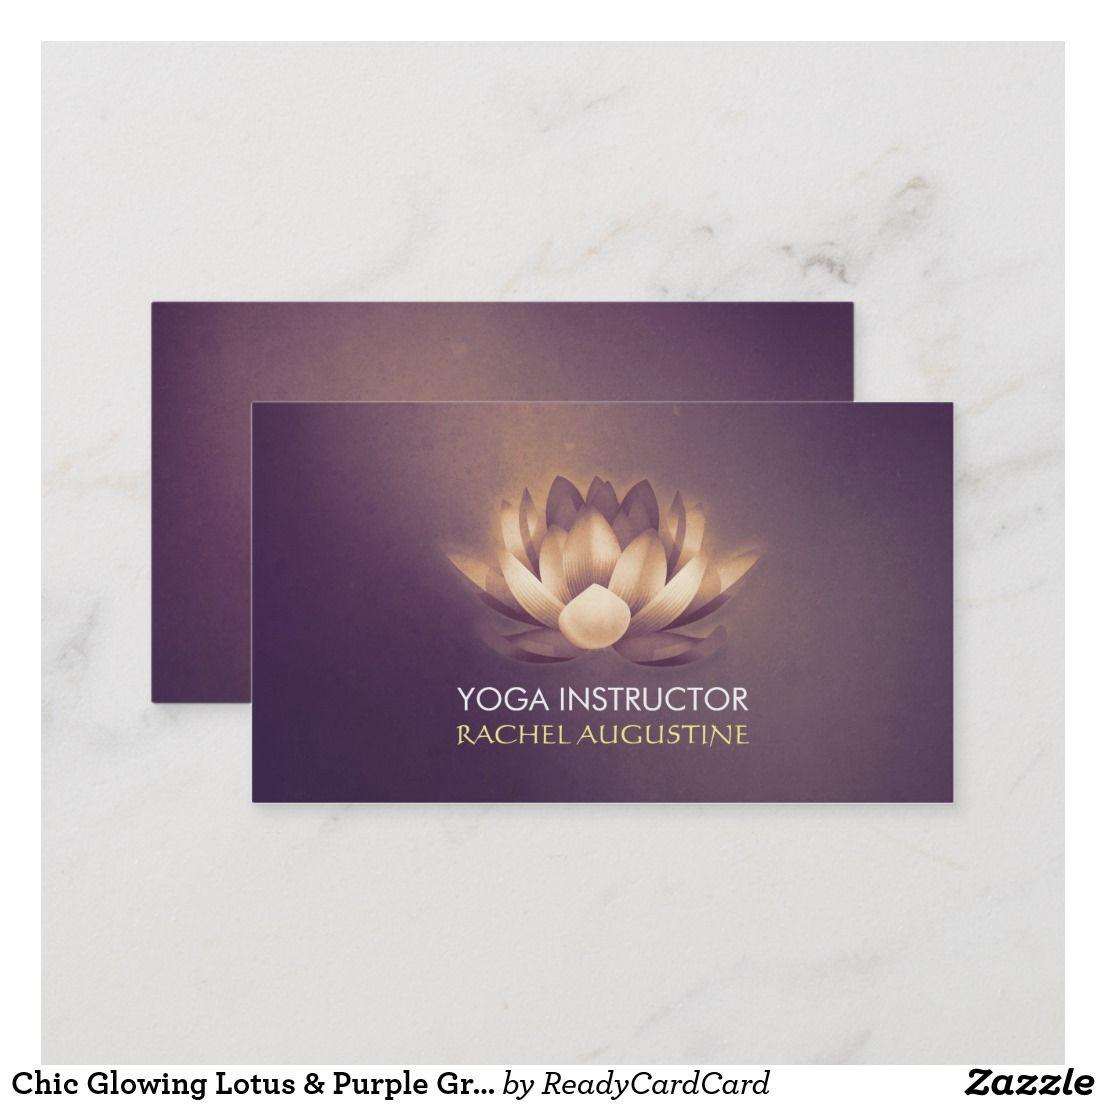 Chic Glowing Lotus Purple Grunge Yoga Instructor Business Card